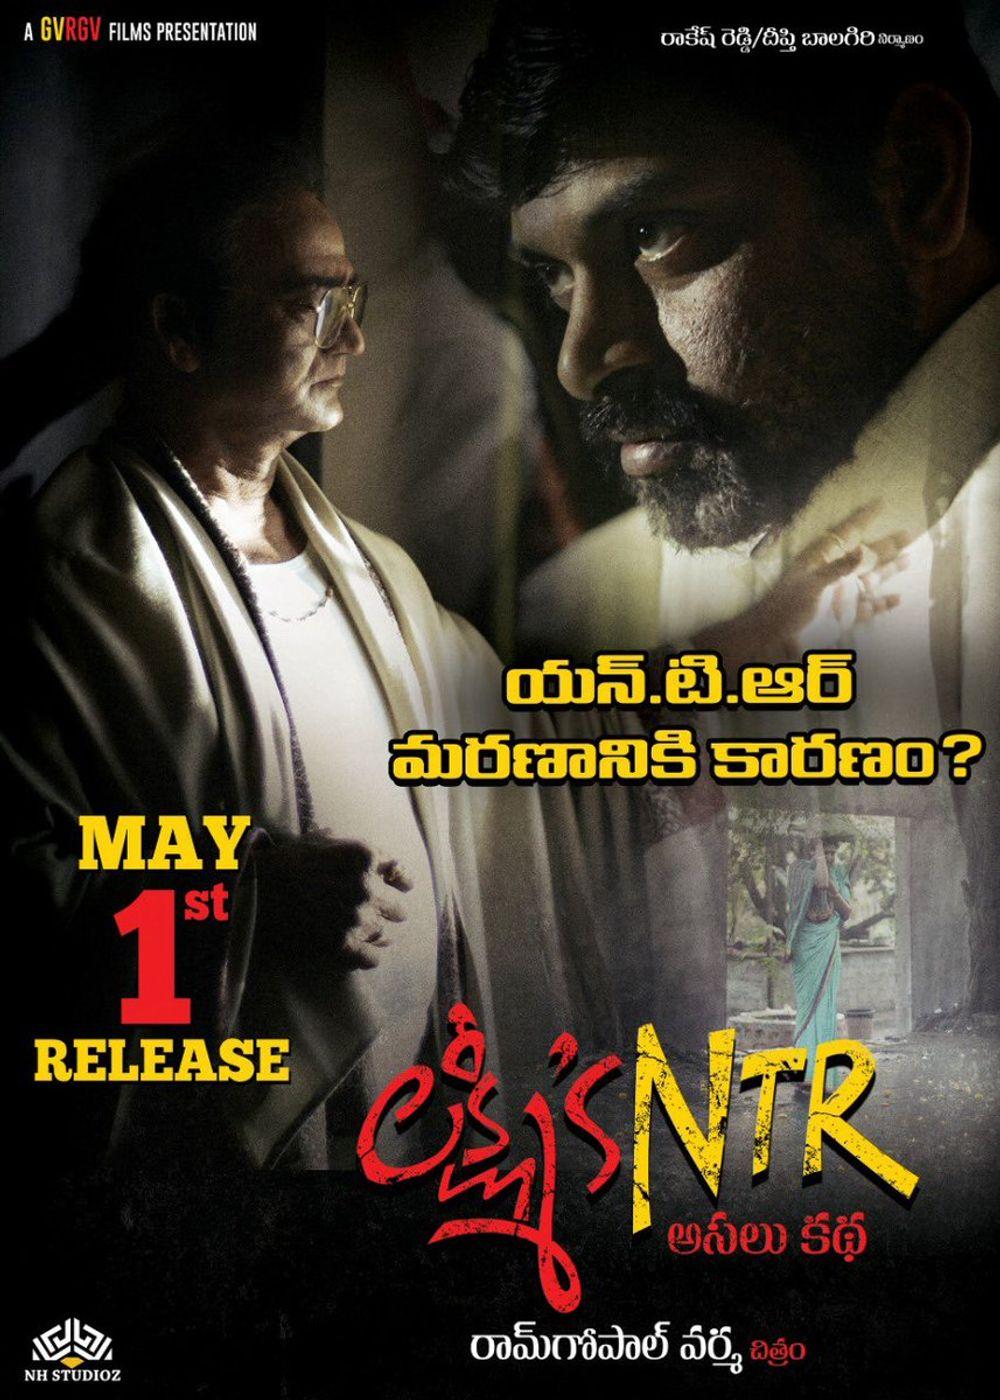 Lakshmi's NTR-banner